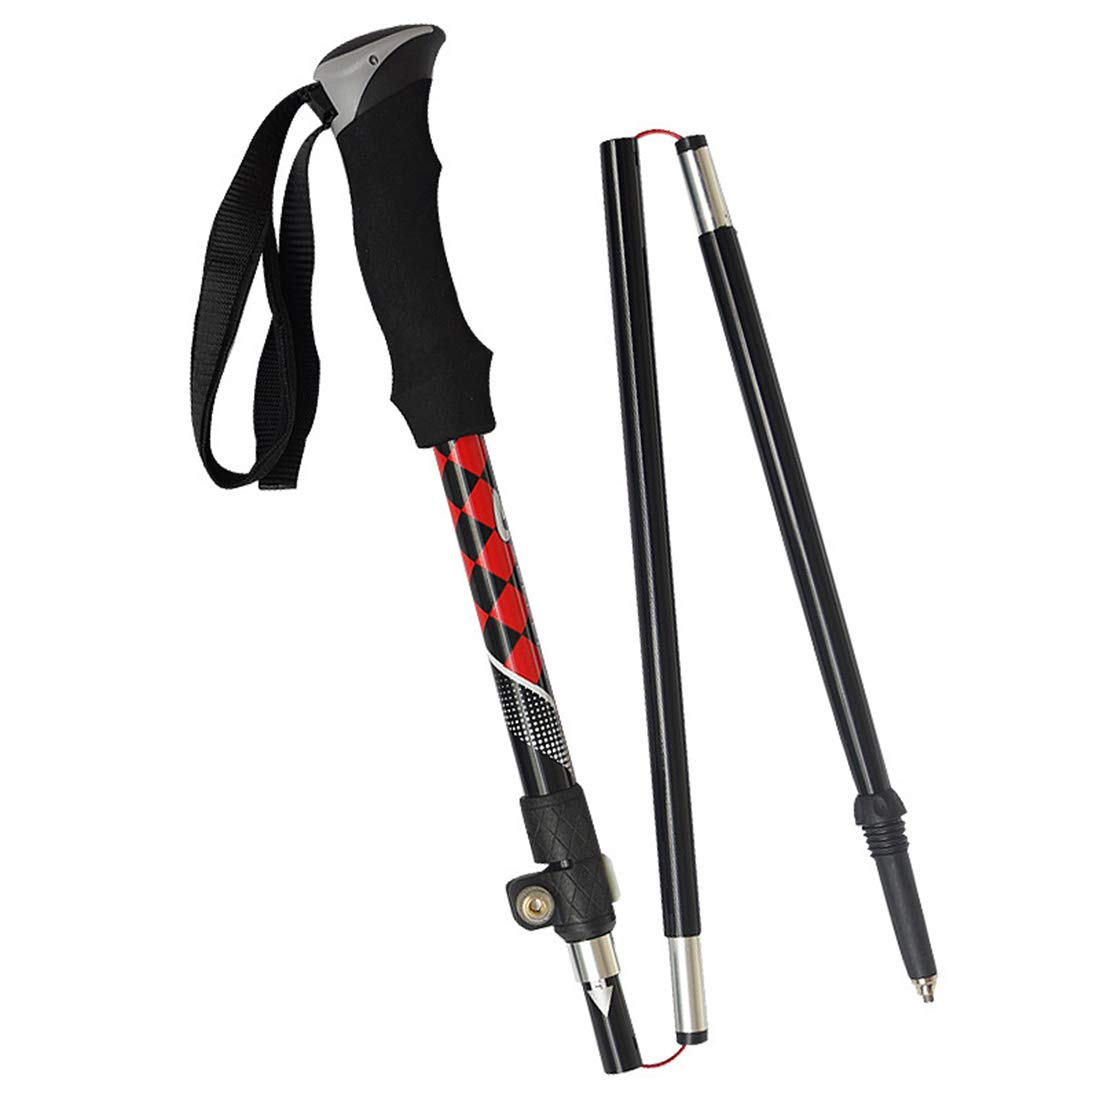 Xasclnis Outdoor Sports Lock Trekking Pole Ultraleicht Wandern Eva Griff Kohlefaser Spazierstock Teleskop Folding Stick (Farbe   rot)